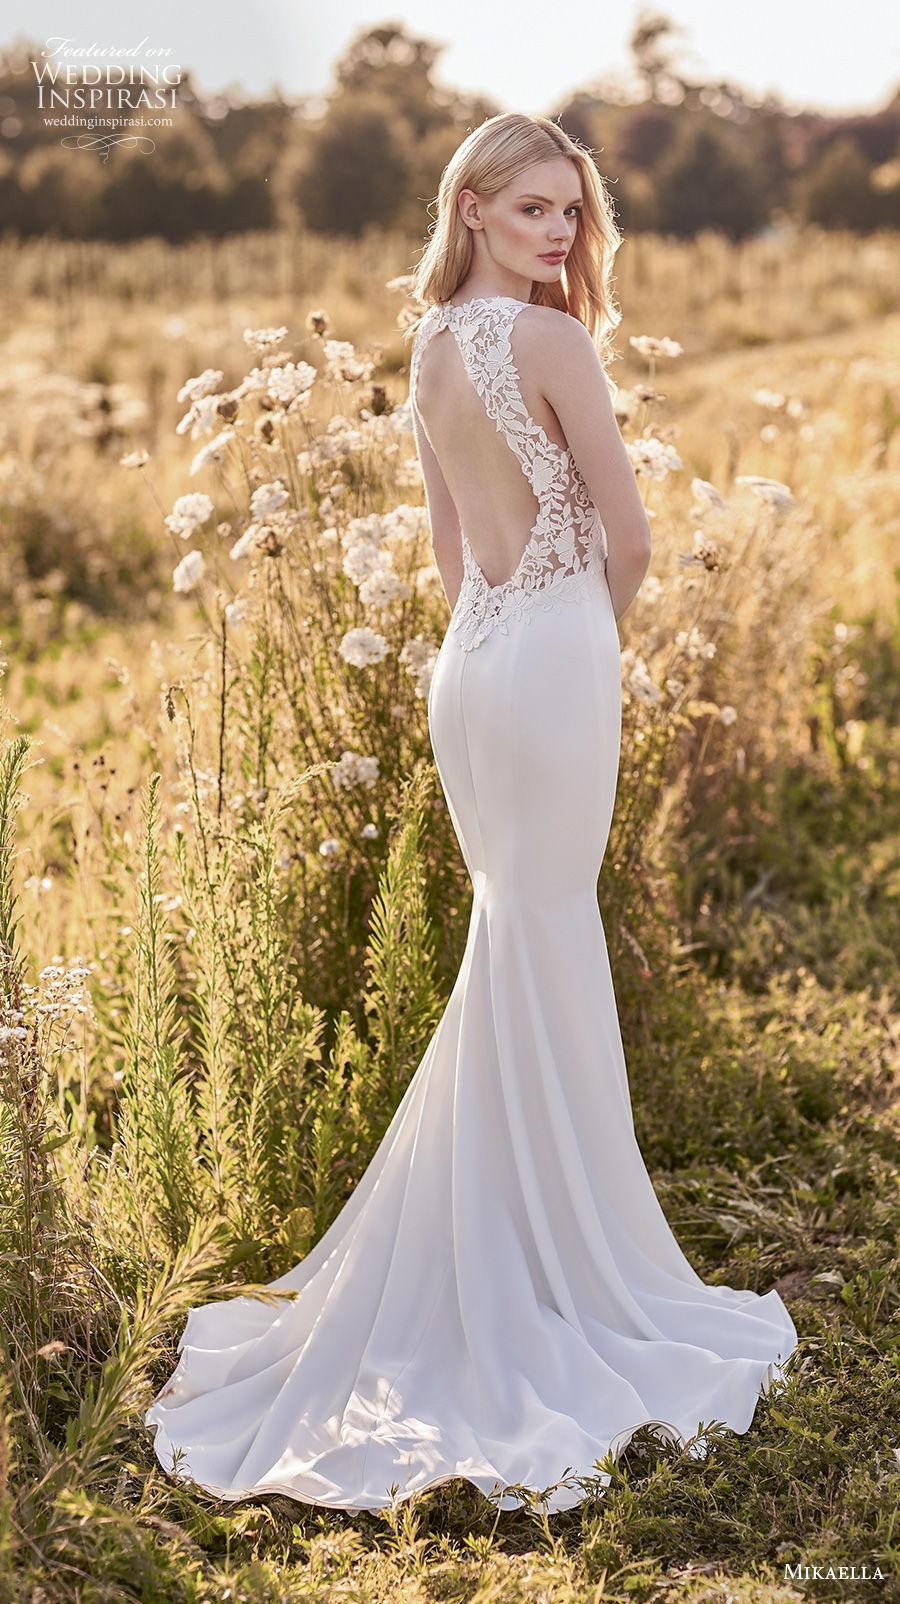 mikaella spring 2020 bridal sleeveless halter jewel neck simple minimalist elegant fit and flare sheath wedding dress keyhole low back short train (11) bv